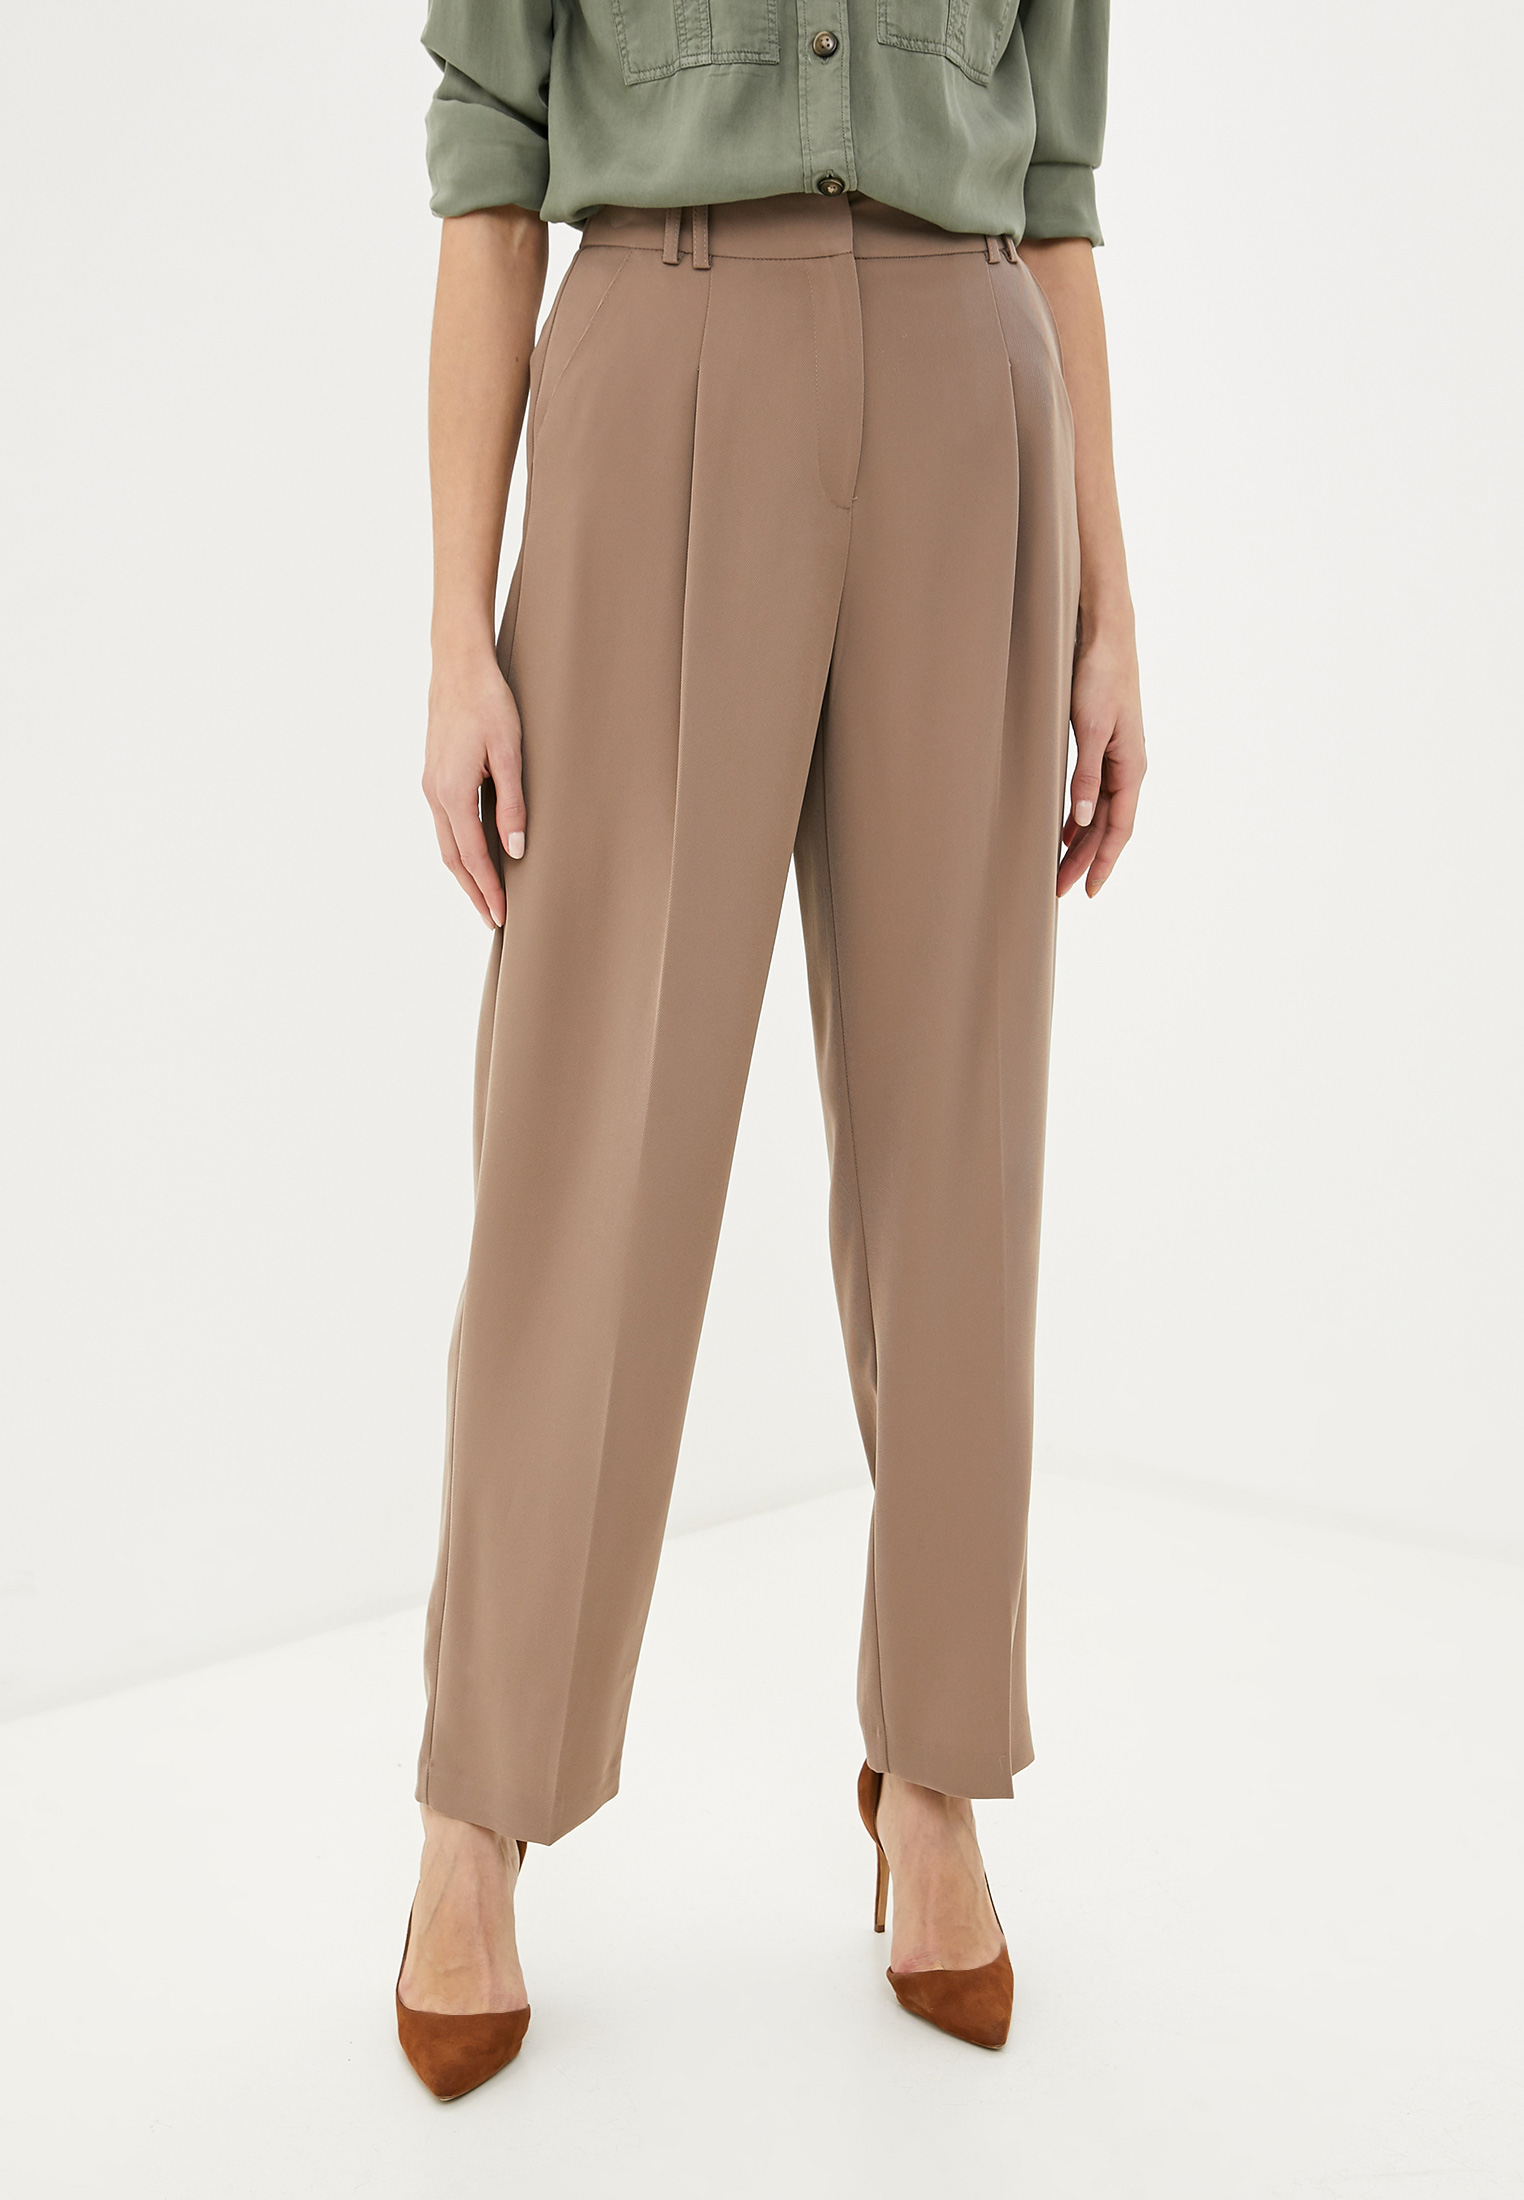 Женские классические брюки Topshop (Топ Шоп) 36R07RMNK